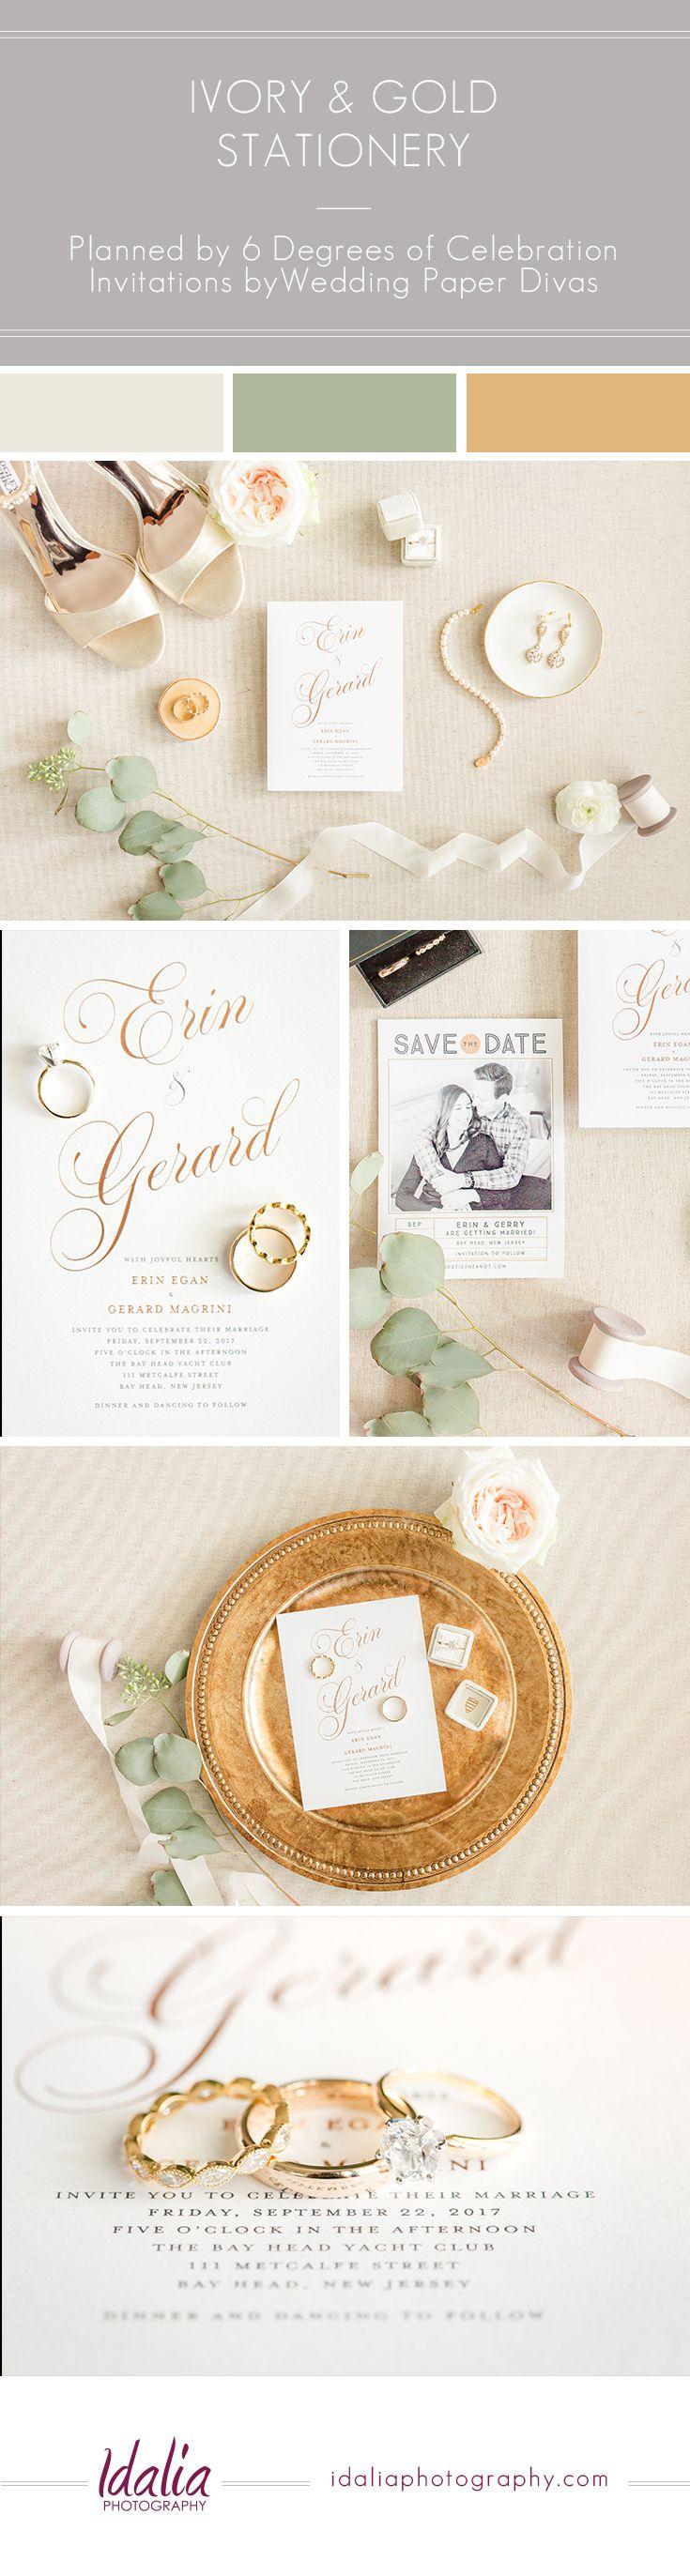 Wedding Invitation by Wedding Paper Divas